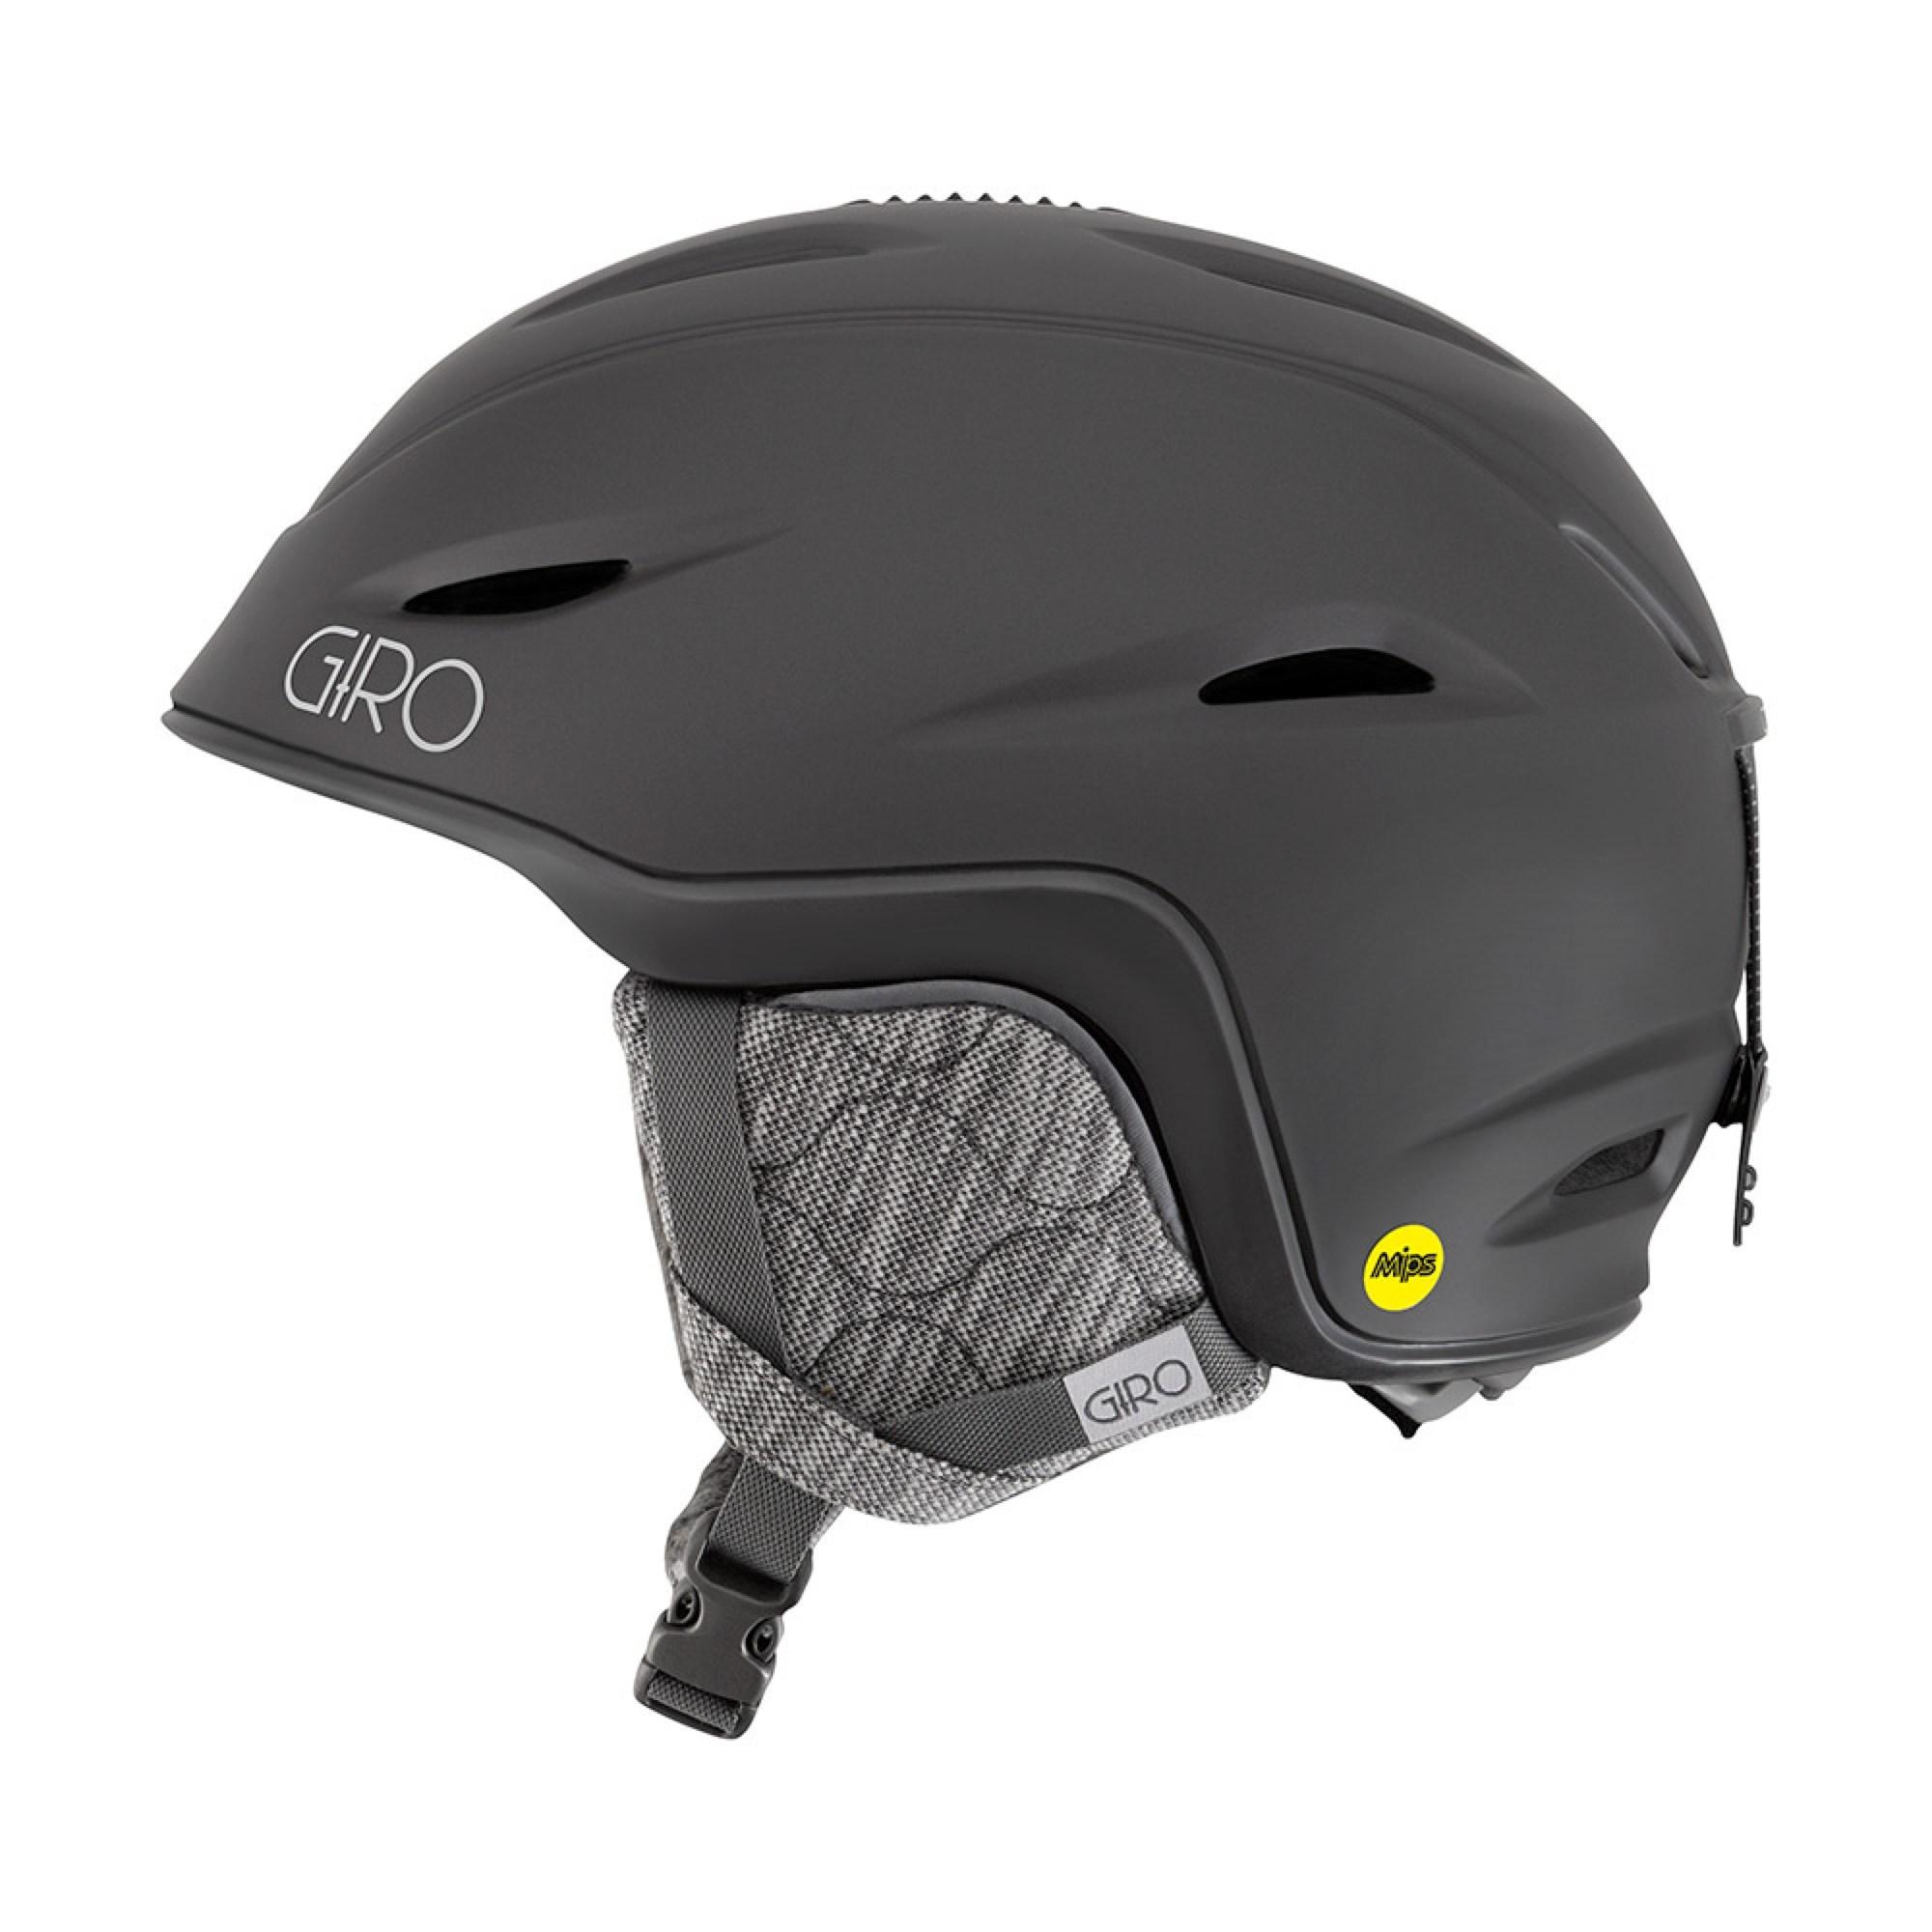 giro helmets reviews - 1000×1000